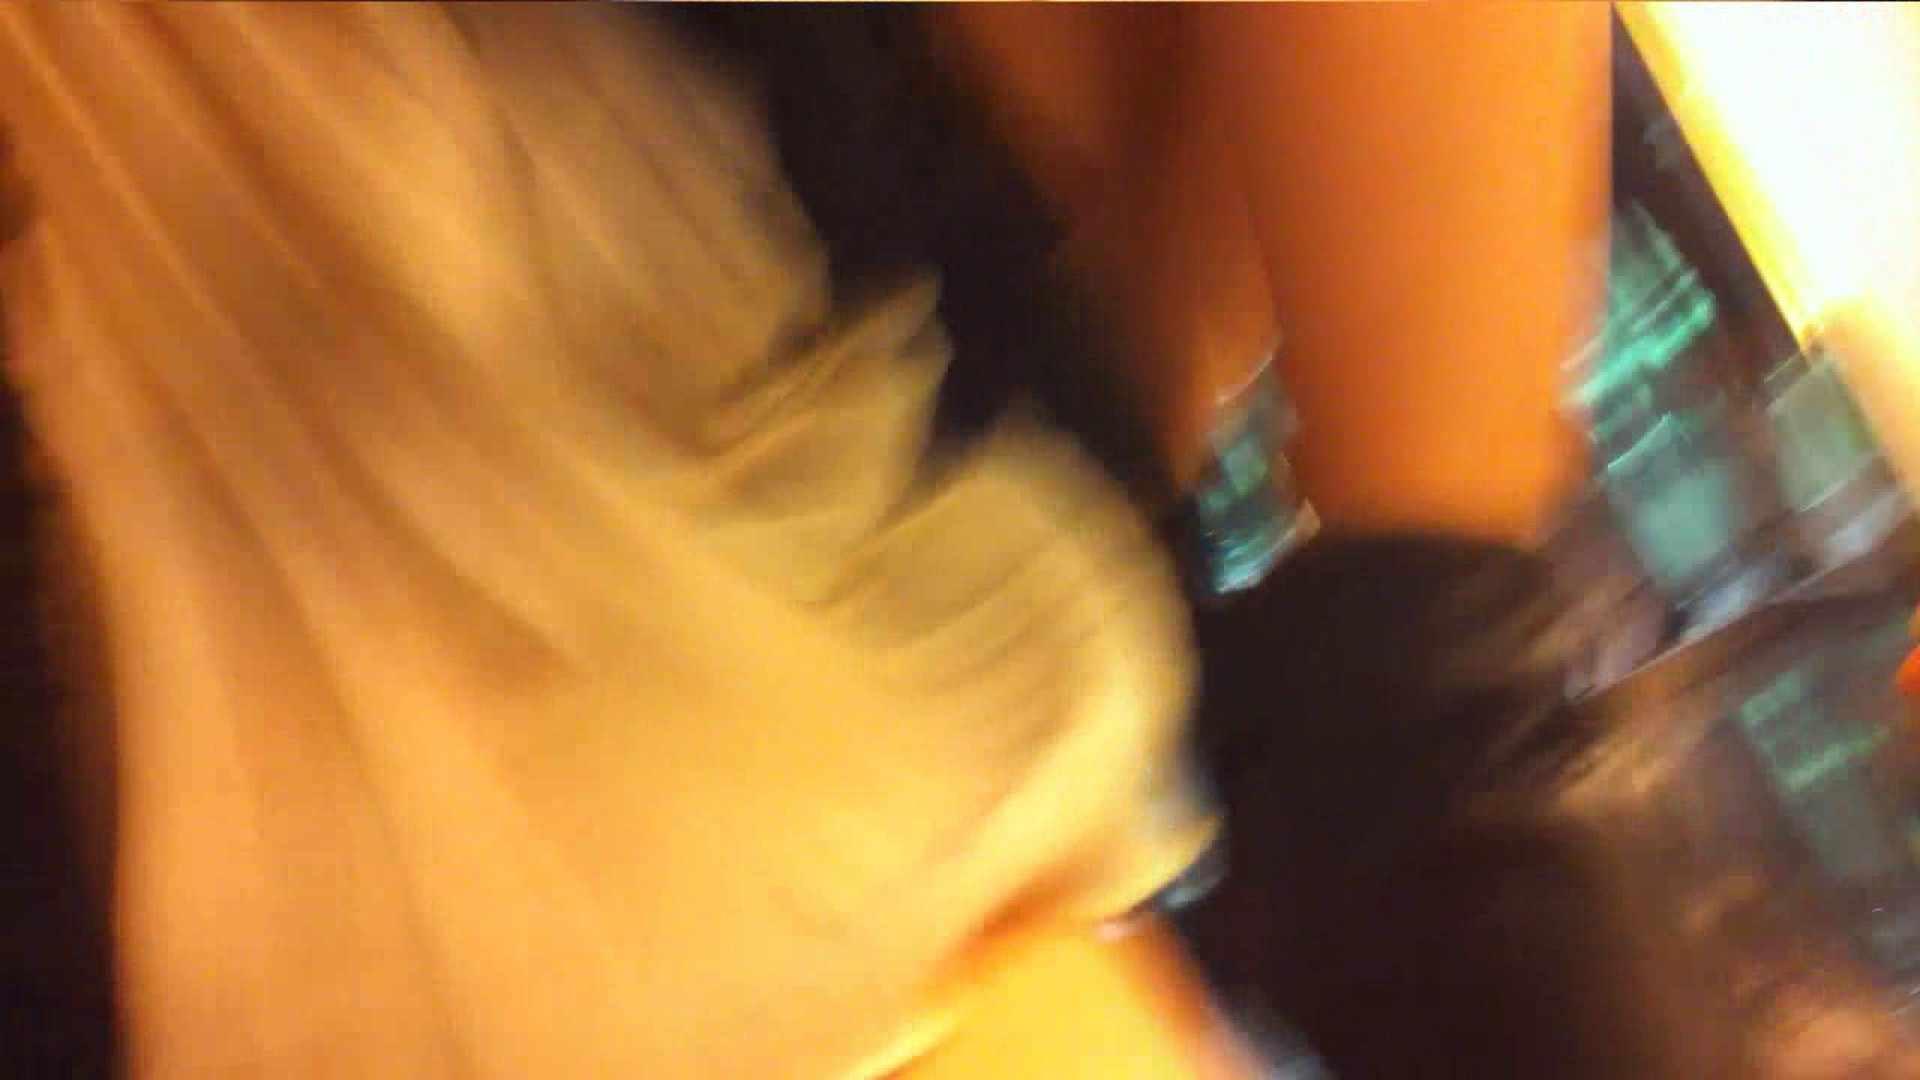 vol.35 美人アパレル胸チラ&パンチラ ひらひらスカートの中身は? 胸チラ 隠し撮りすけべAV動画紹介 108画像 59